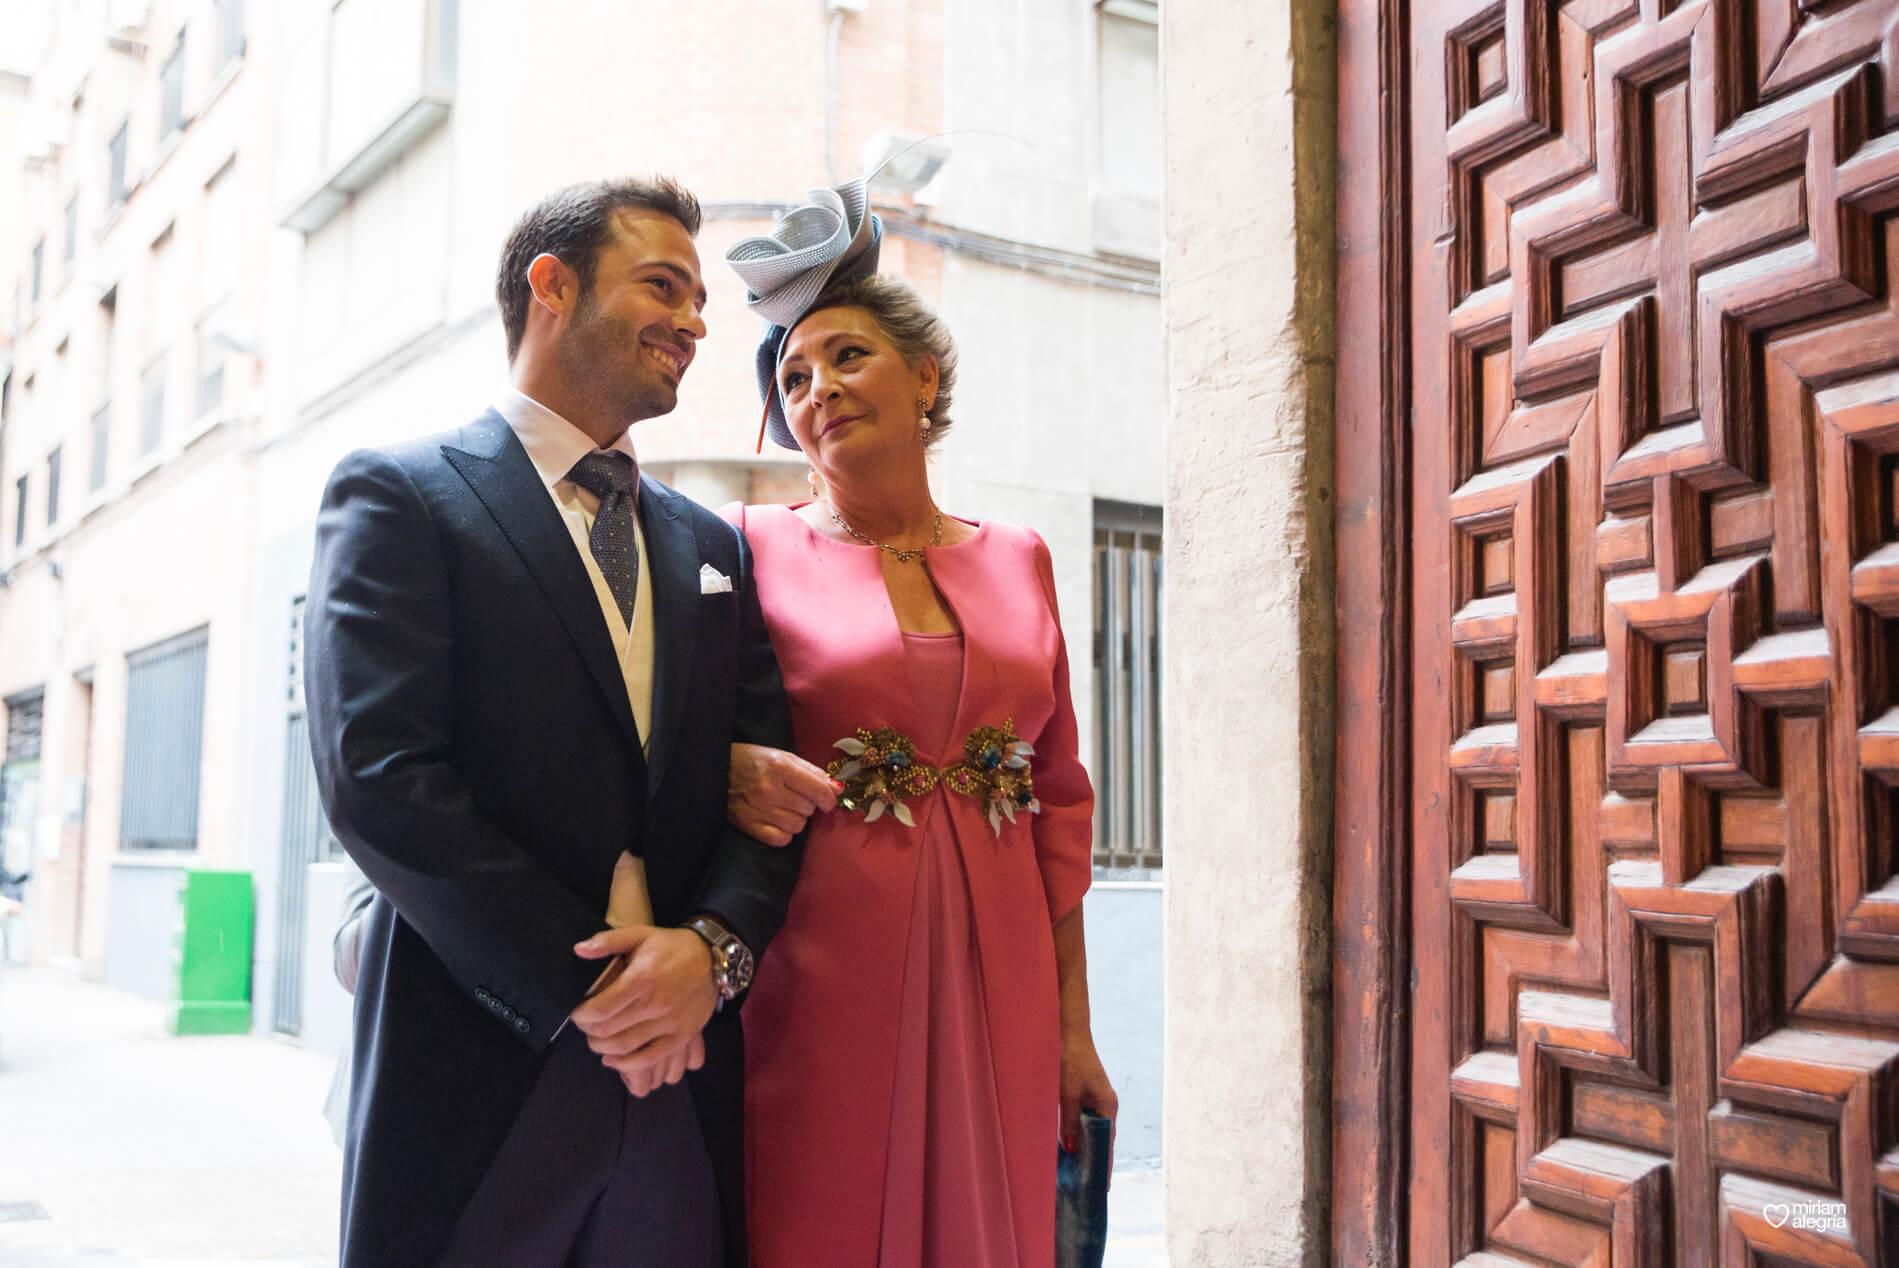 vestido-de-novia-paula-del-vas-miriam-alegria-fotografos-boda-murcia-178